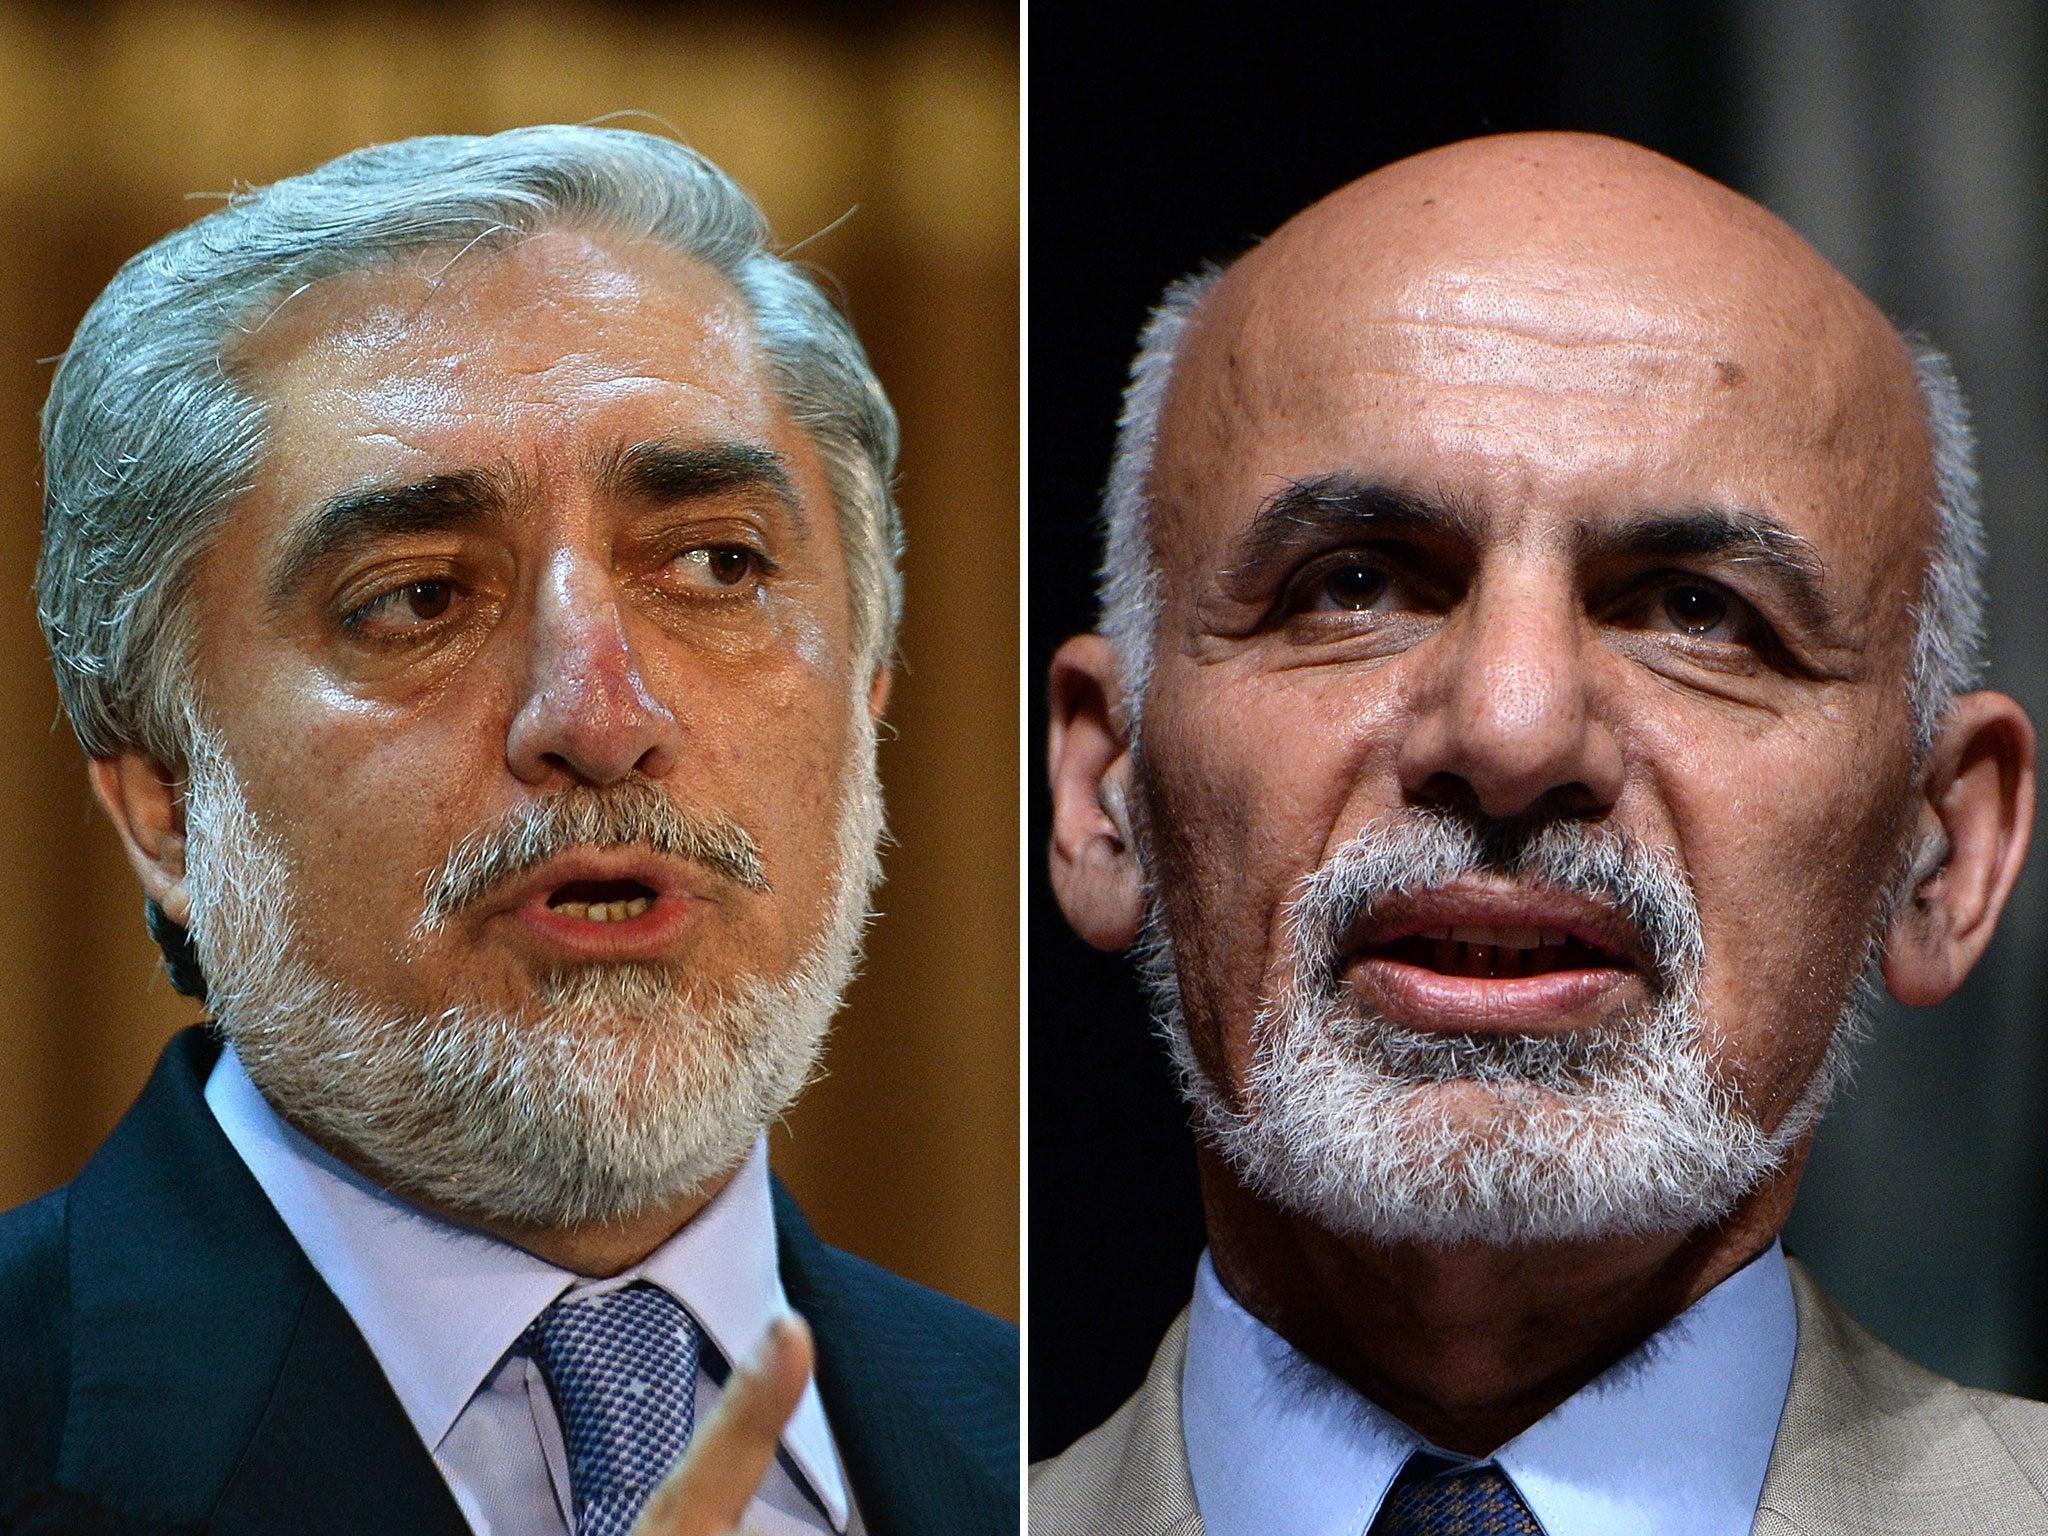 Afghanistan election rivals Abdullah Abdullah and Ashraf